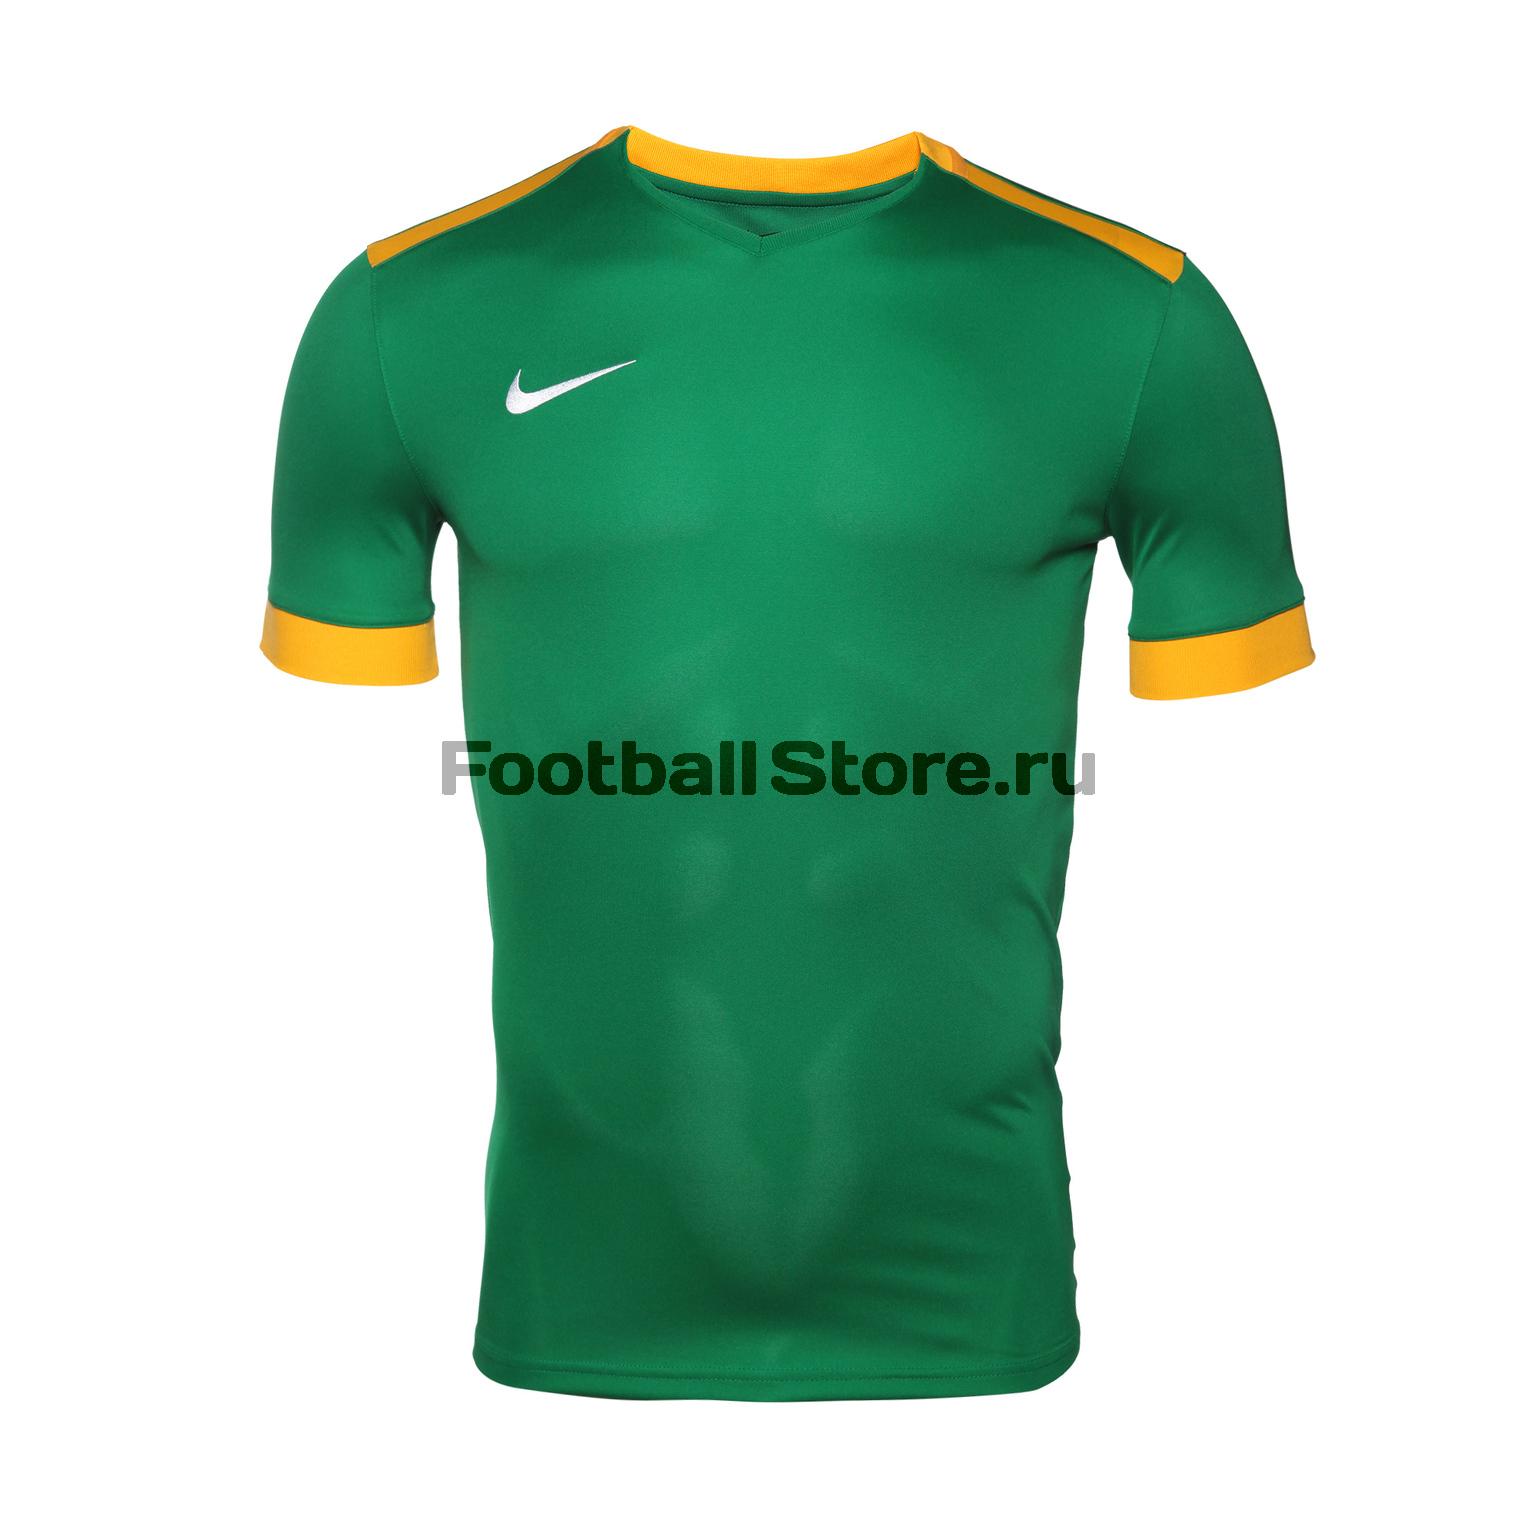 Футболка игровая Nike Park Derby II JSY SS 894312-302 футболка игровая nike ls park derby jsy 588414 106